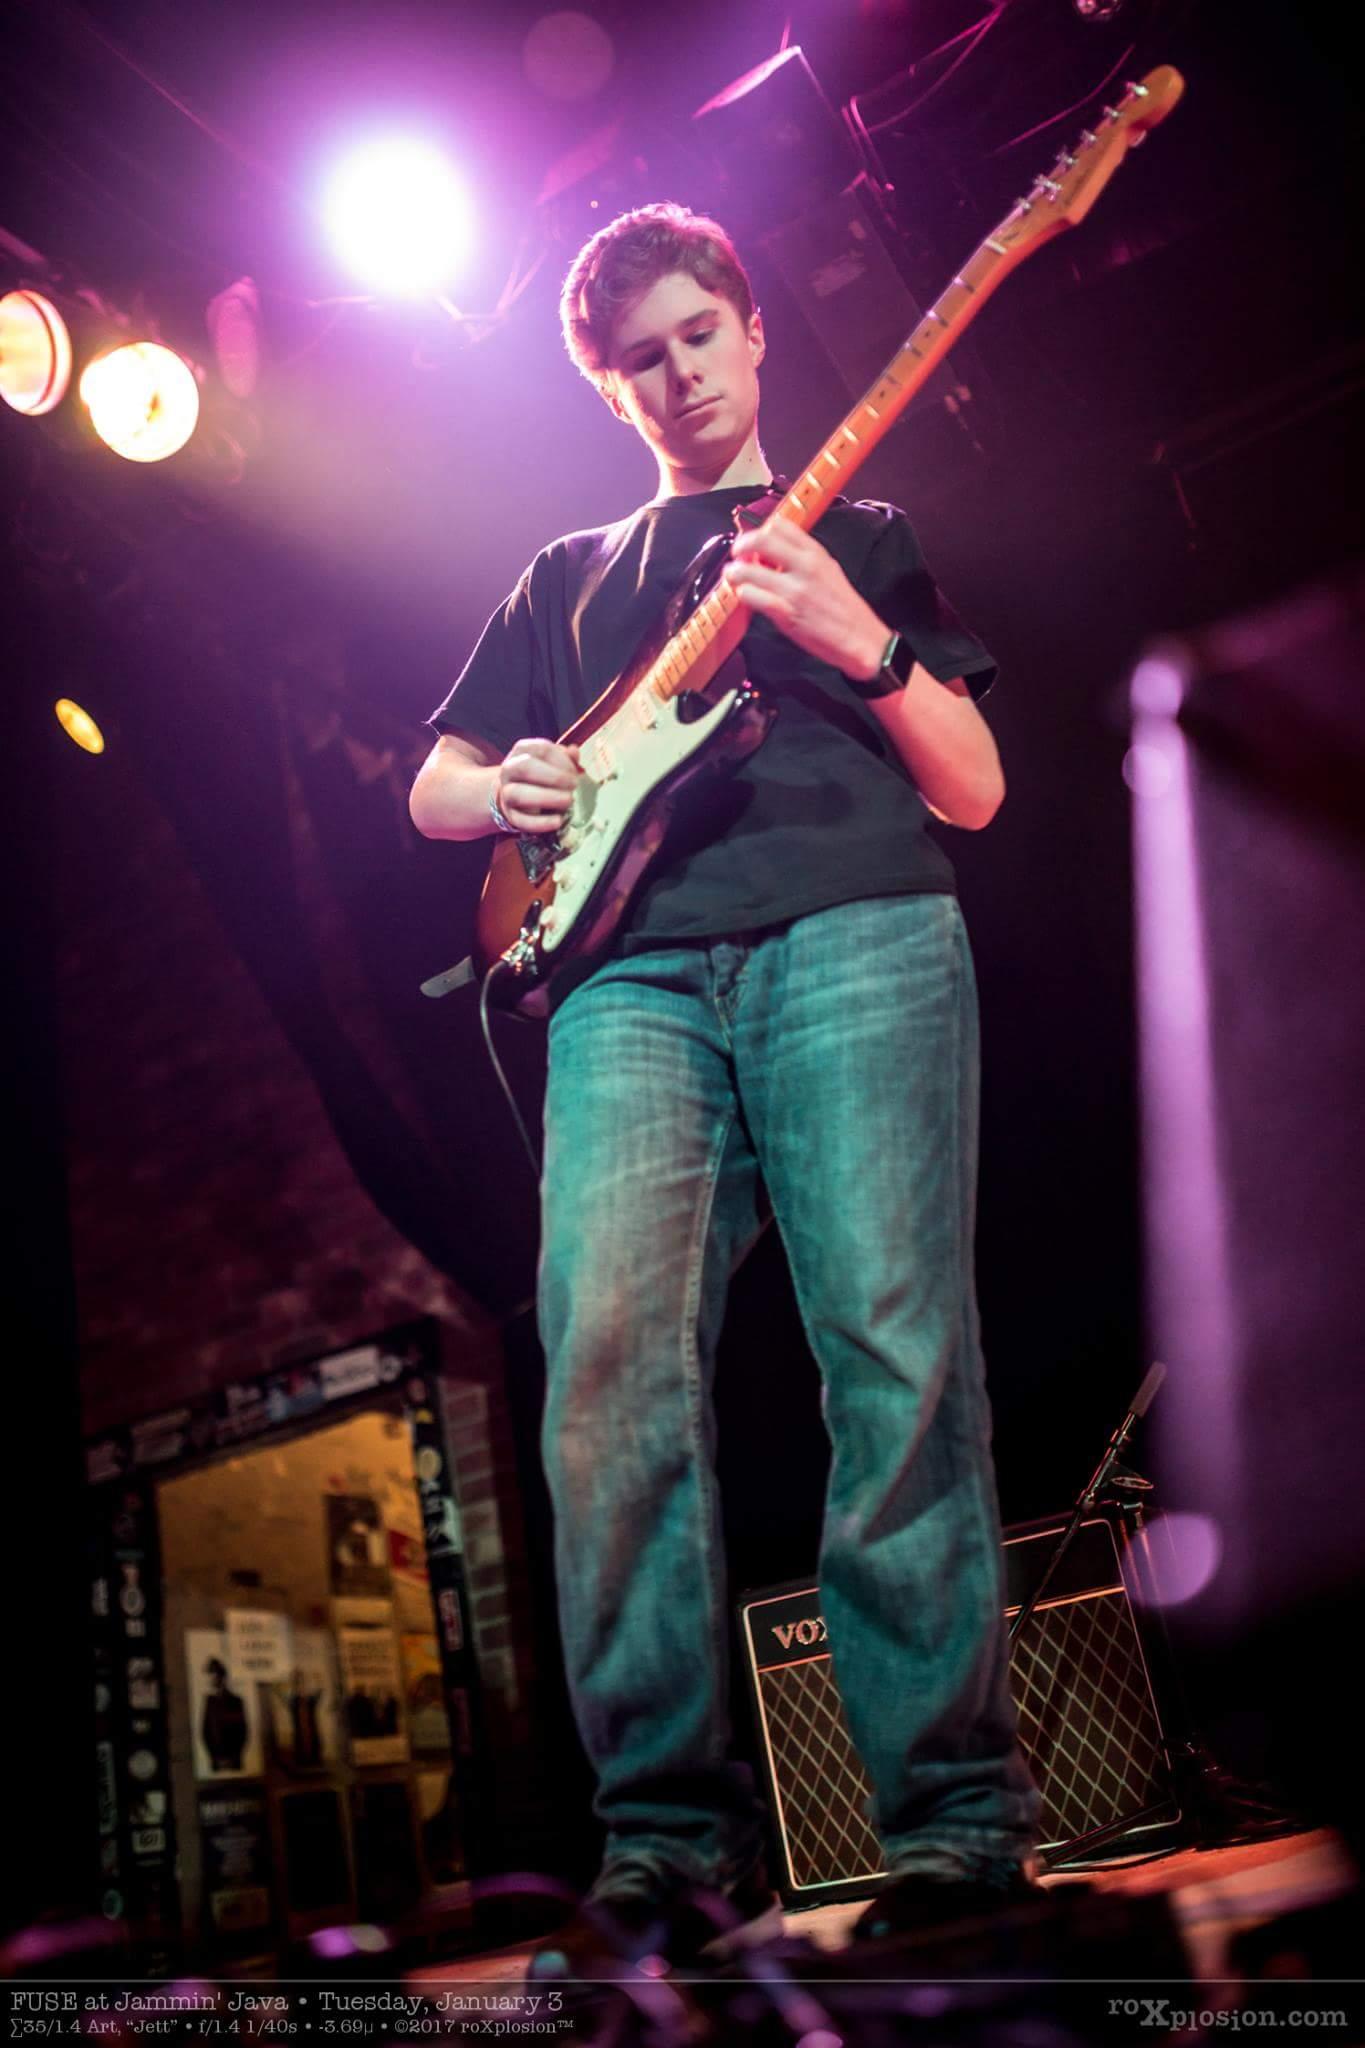 FUSE, Teen Rock Band, Maryland, Award Winning Band, Devin Streight